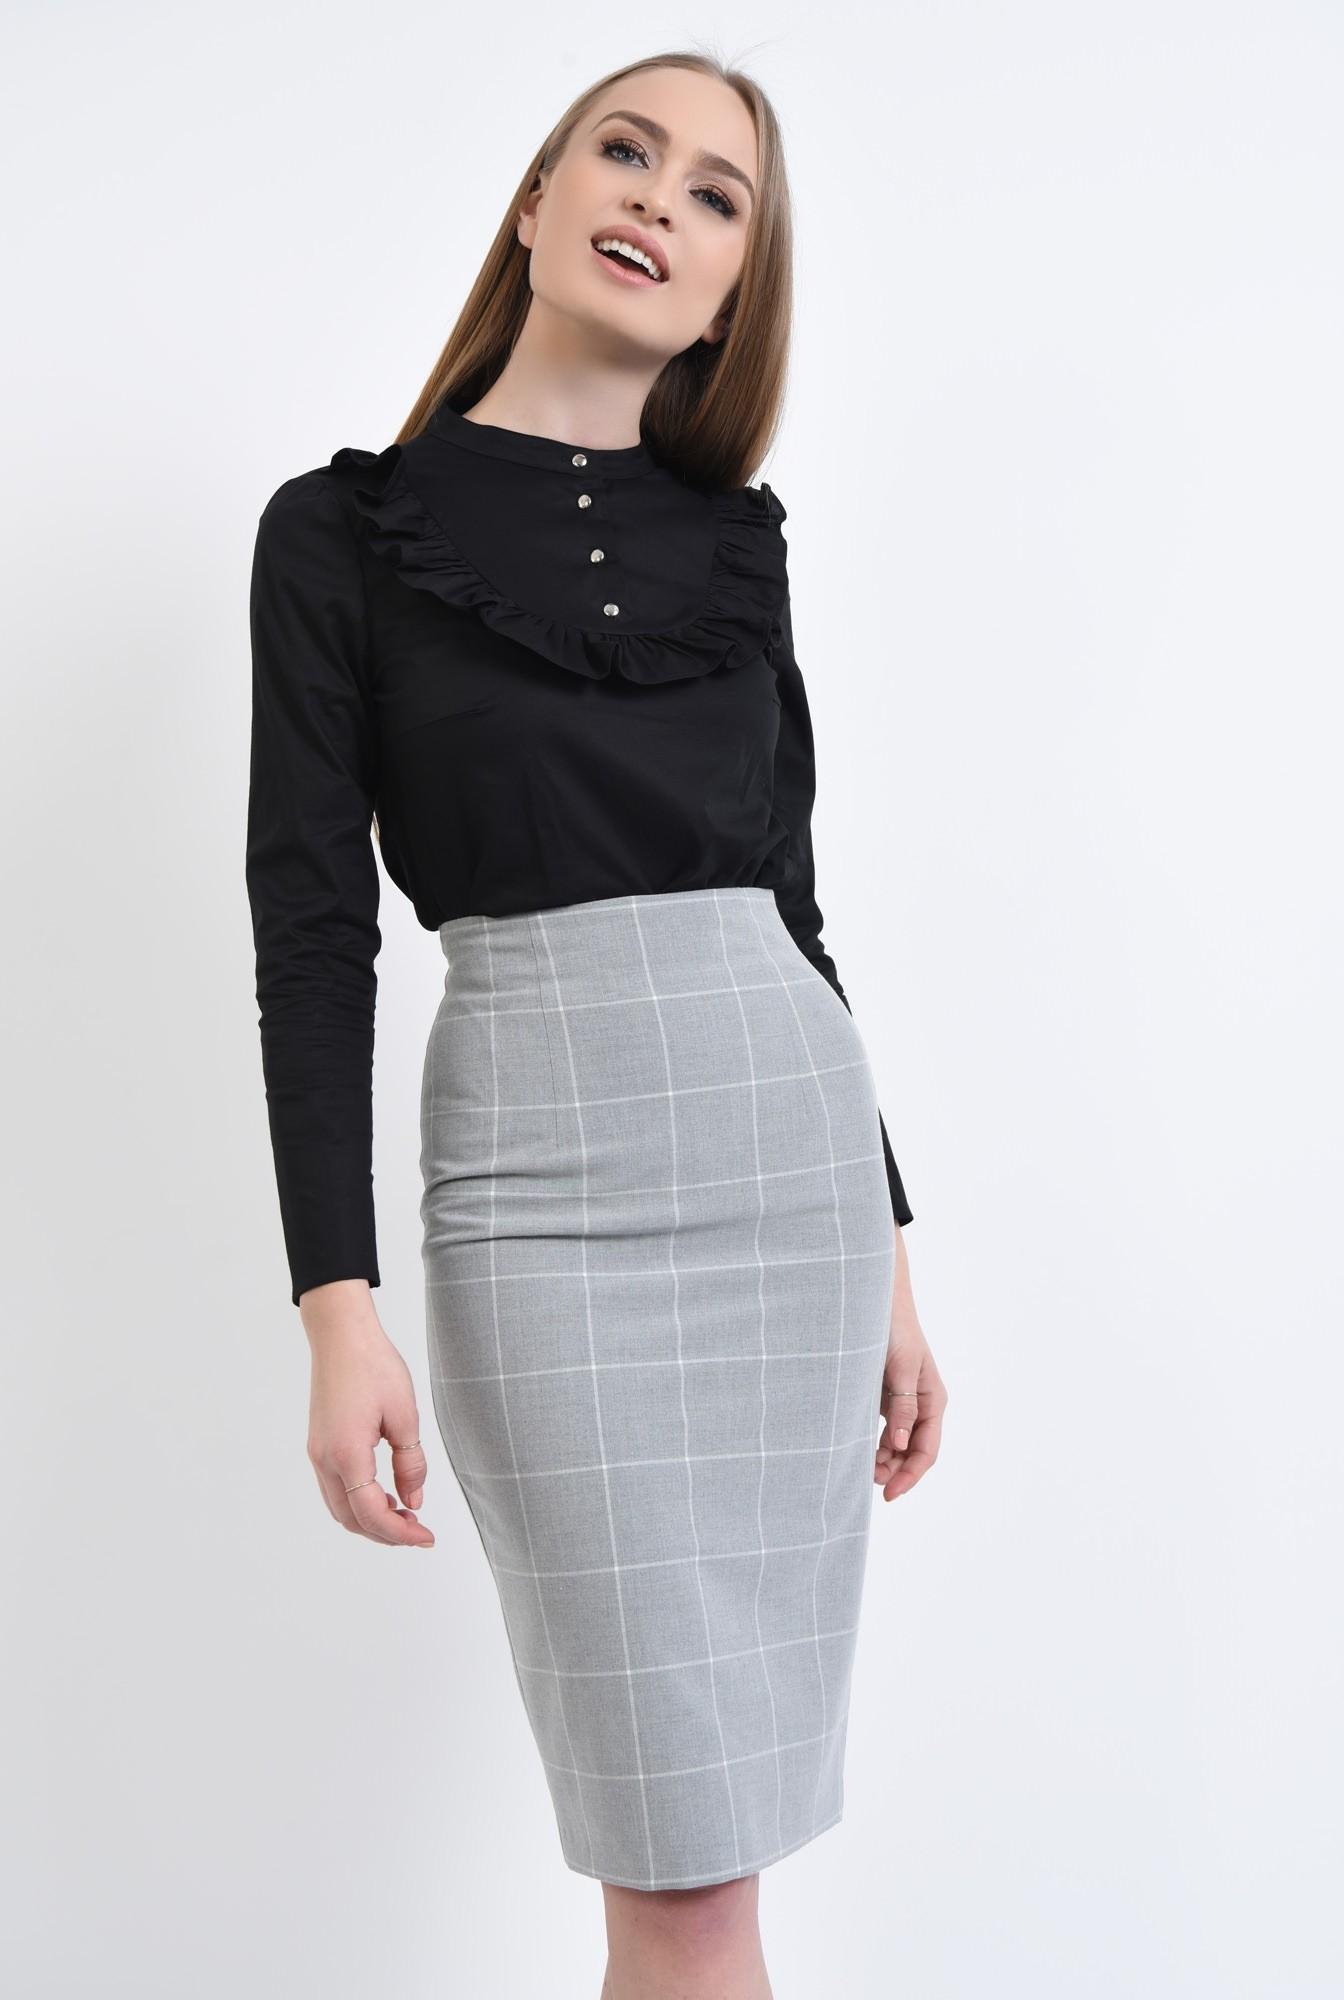 3 - Bluza casual, negru, bumbac